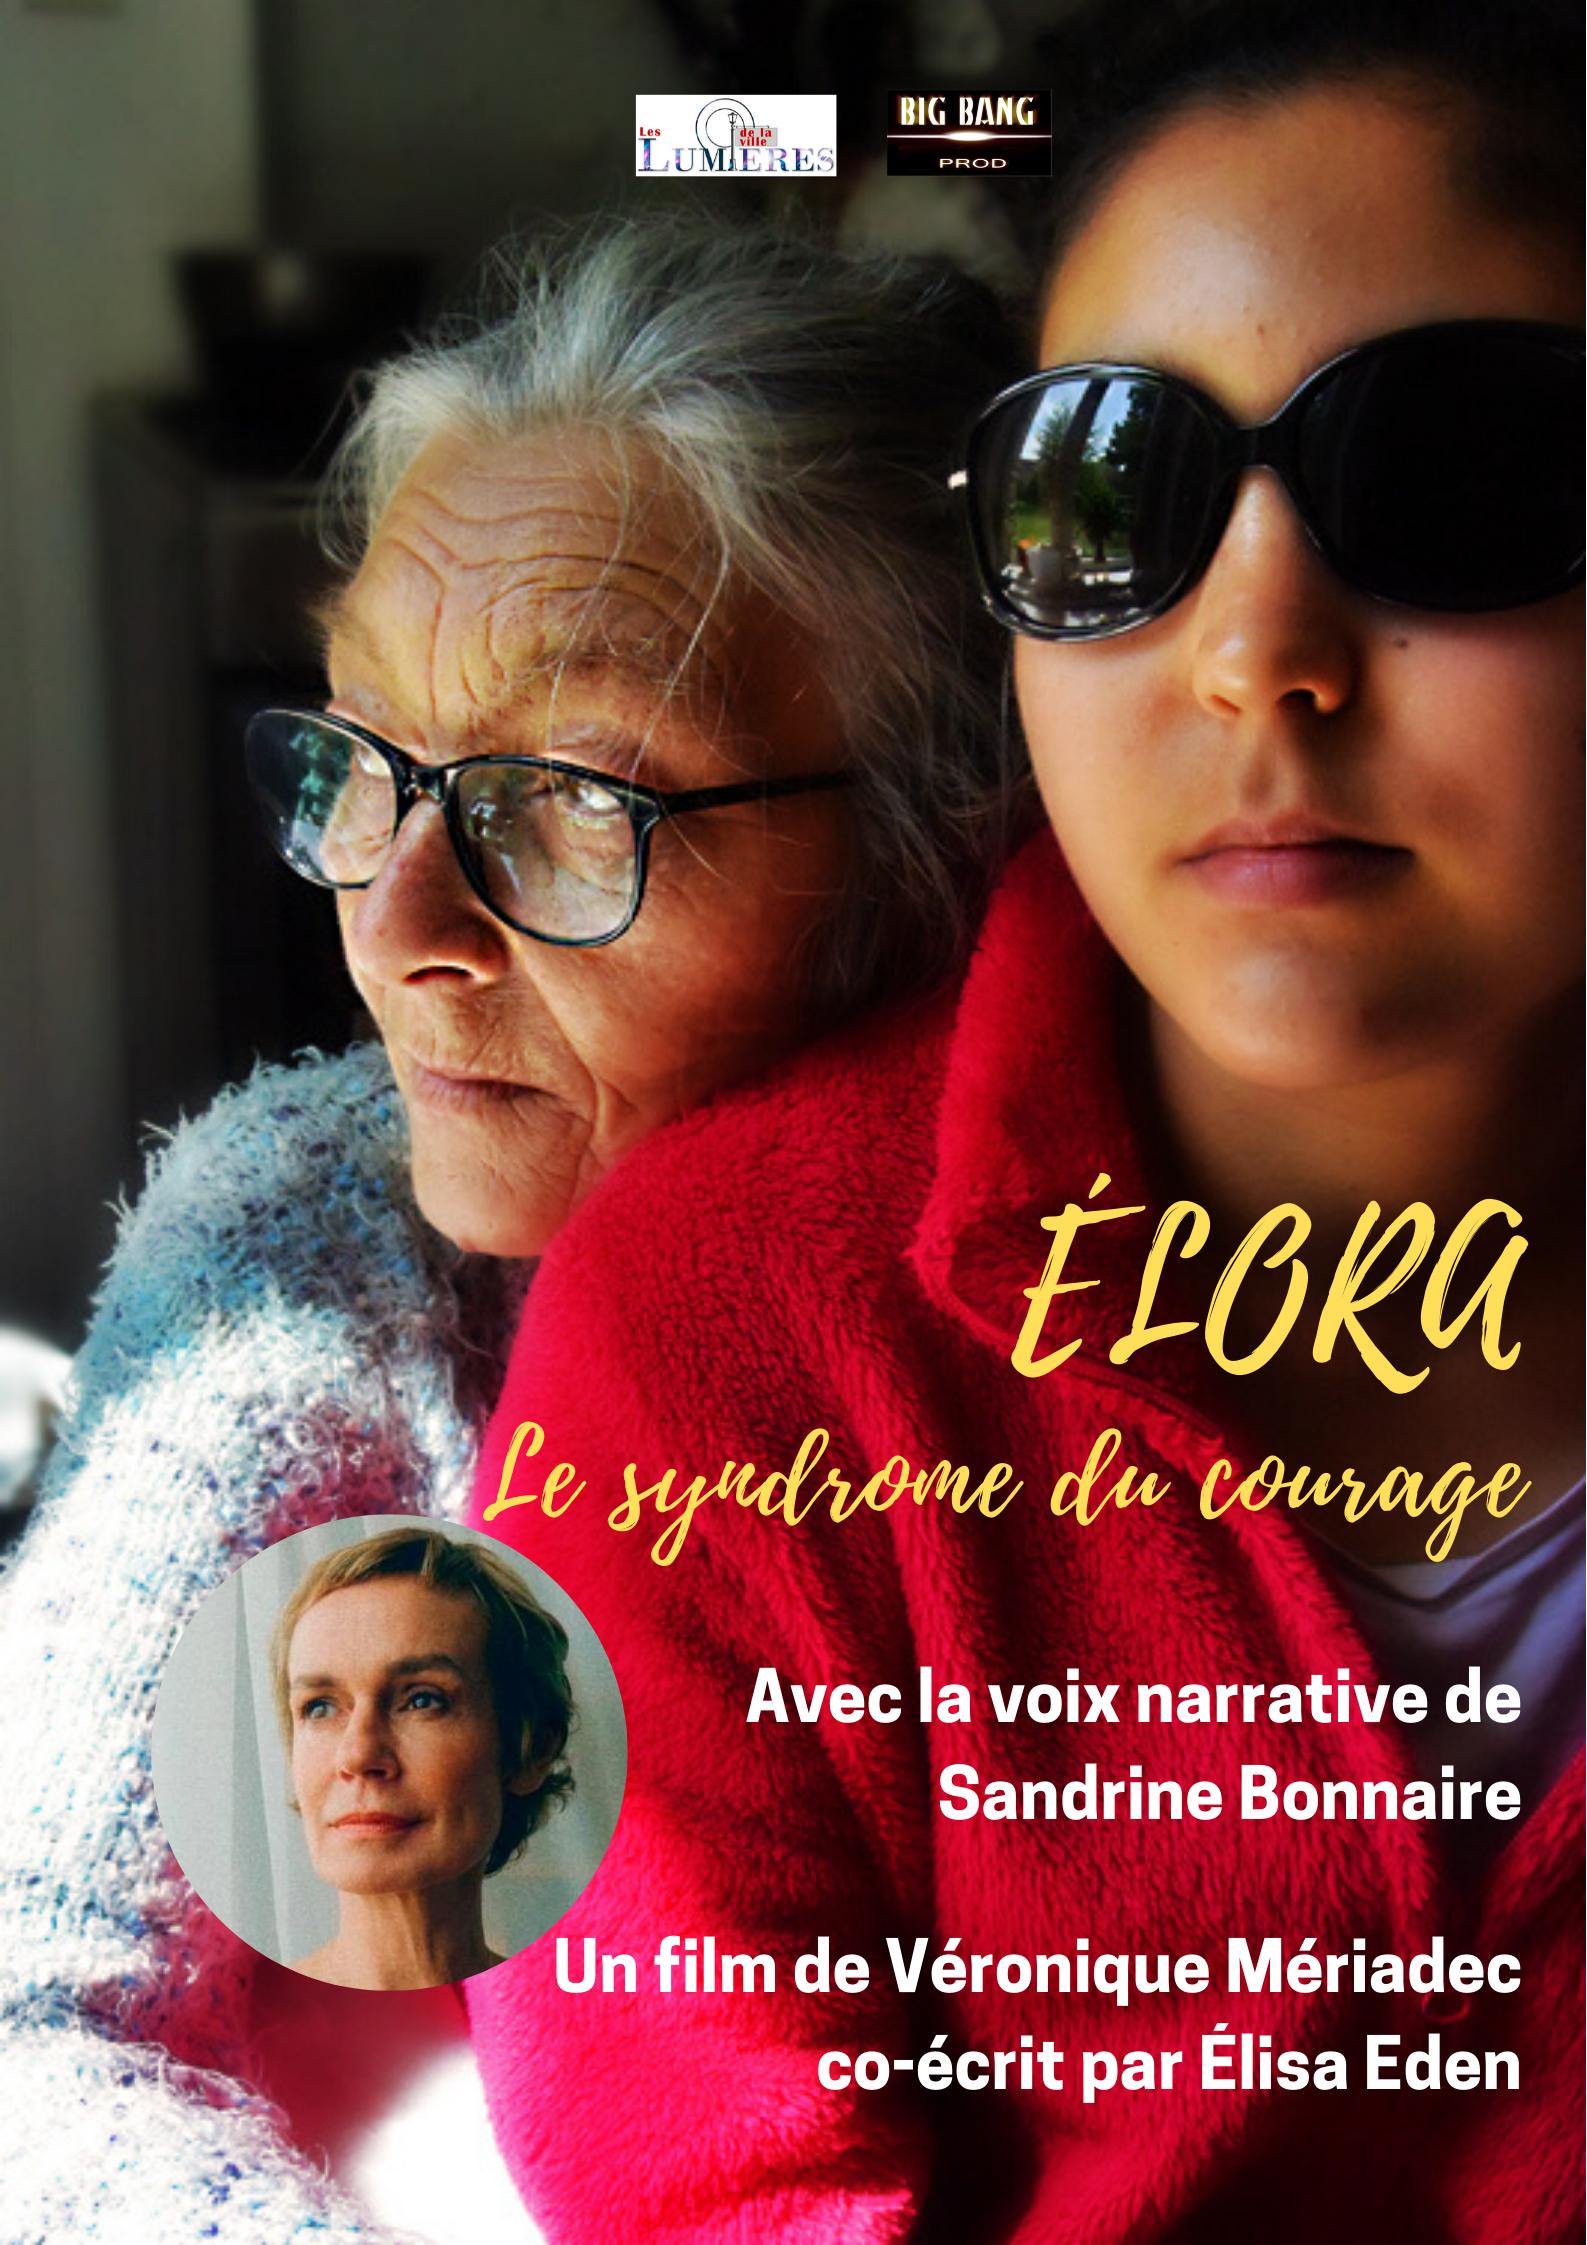 ELORA Le syndrome du courage